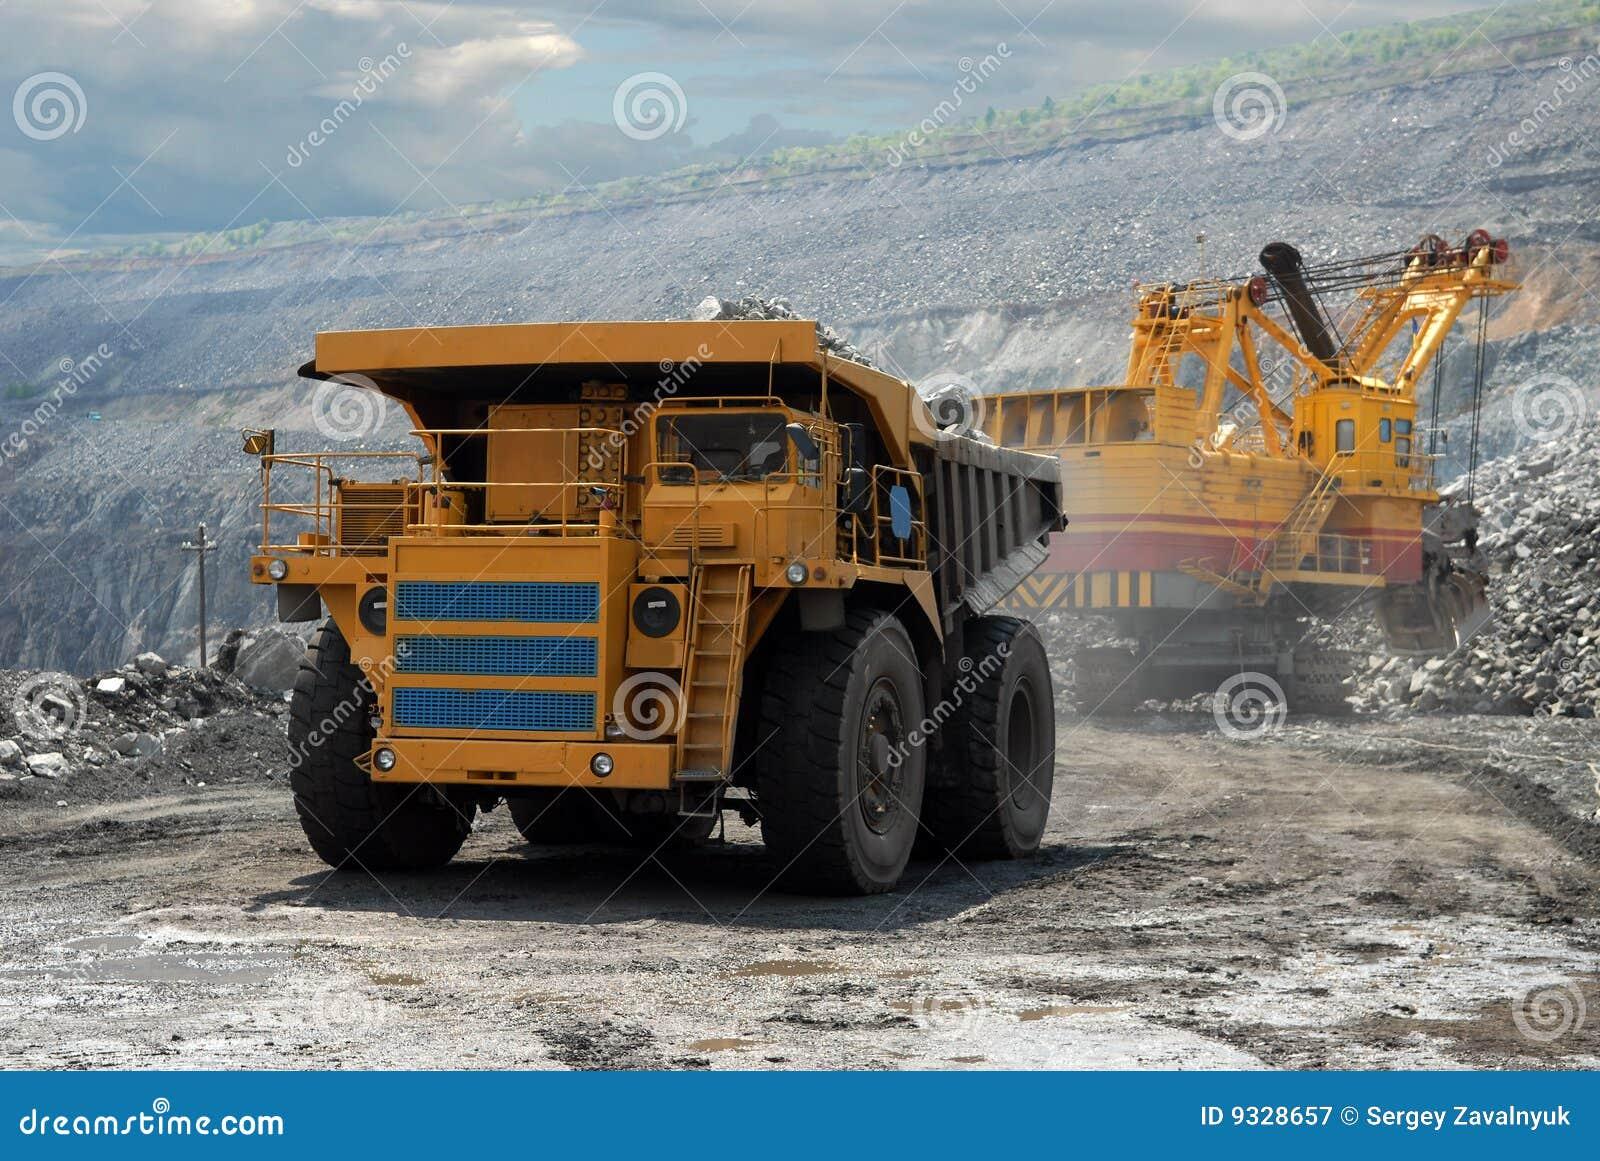 Very Big Dump Body Truck On White 3d Illustration Royalty